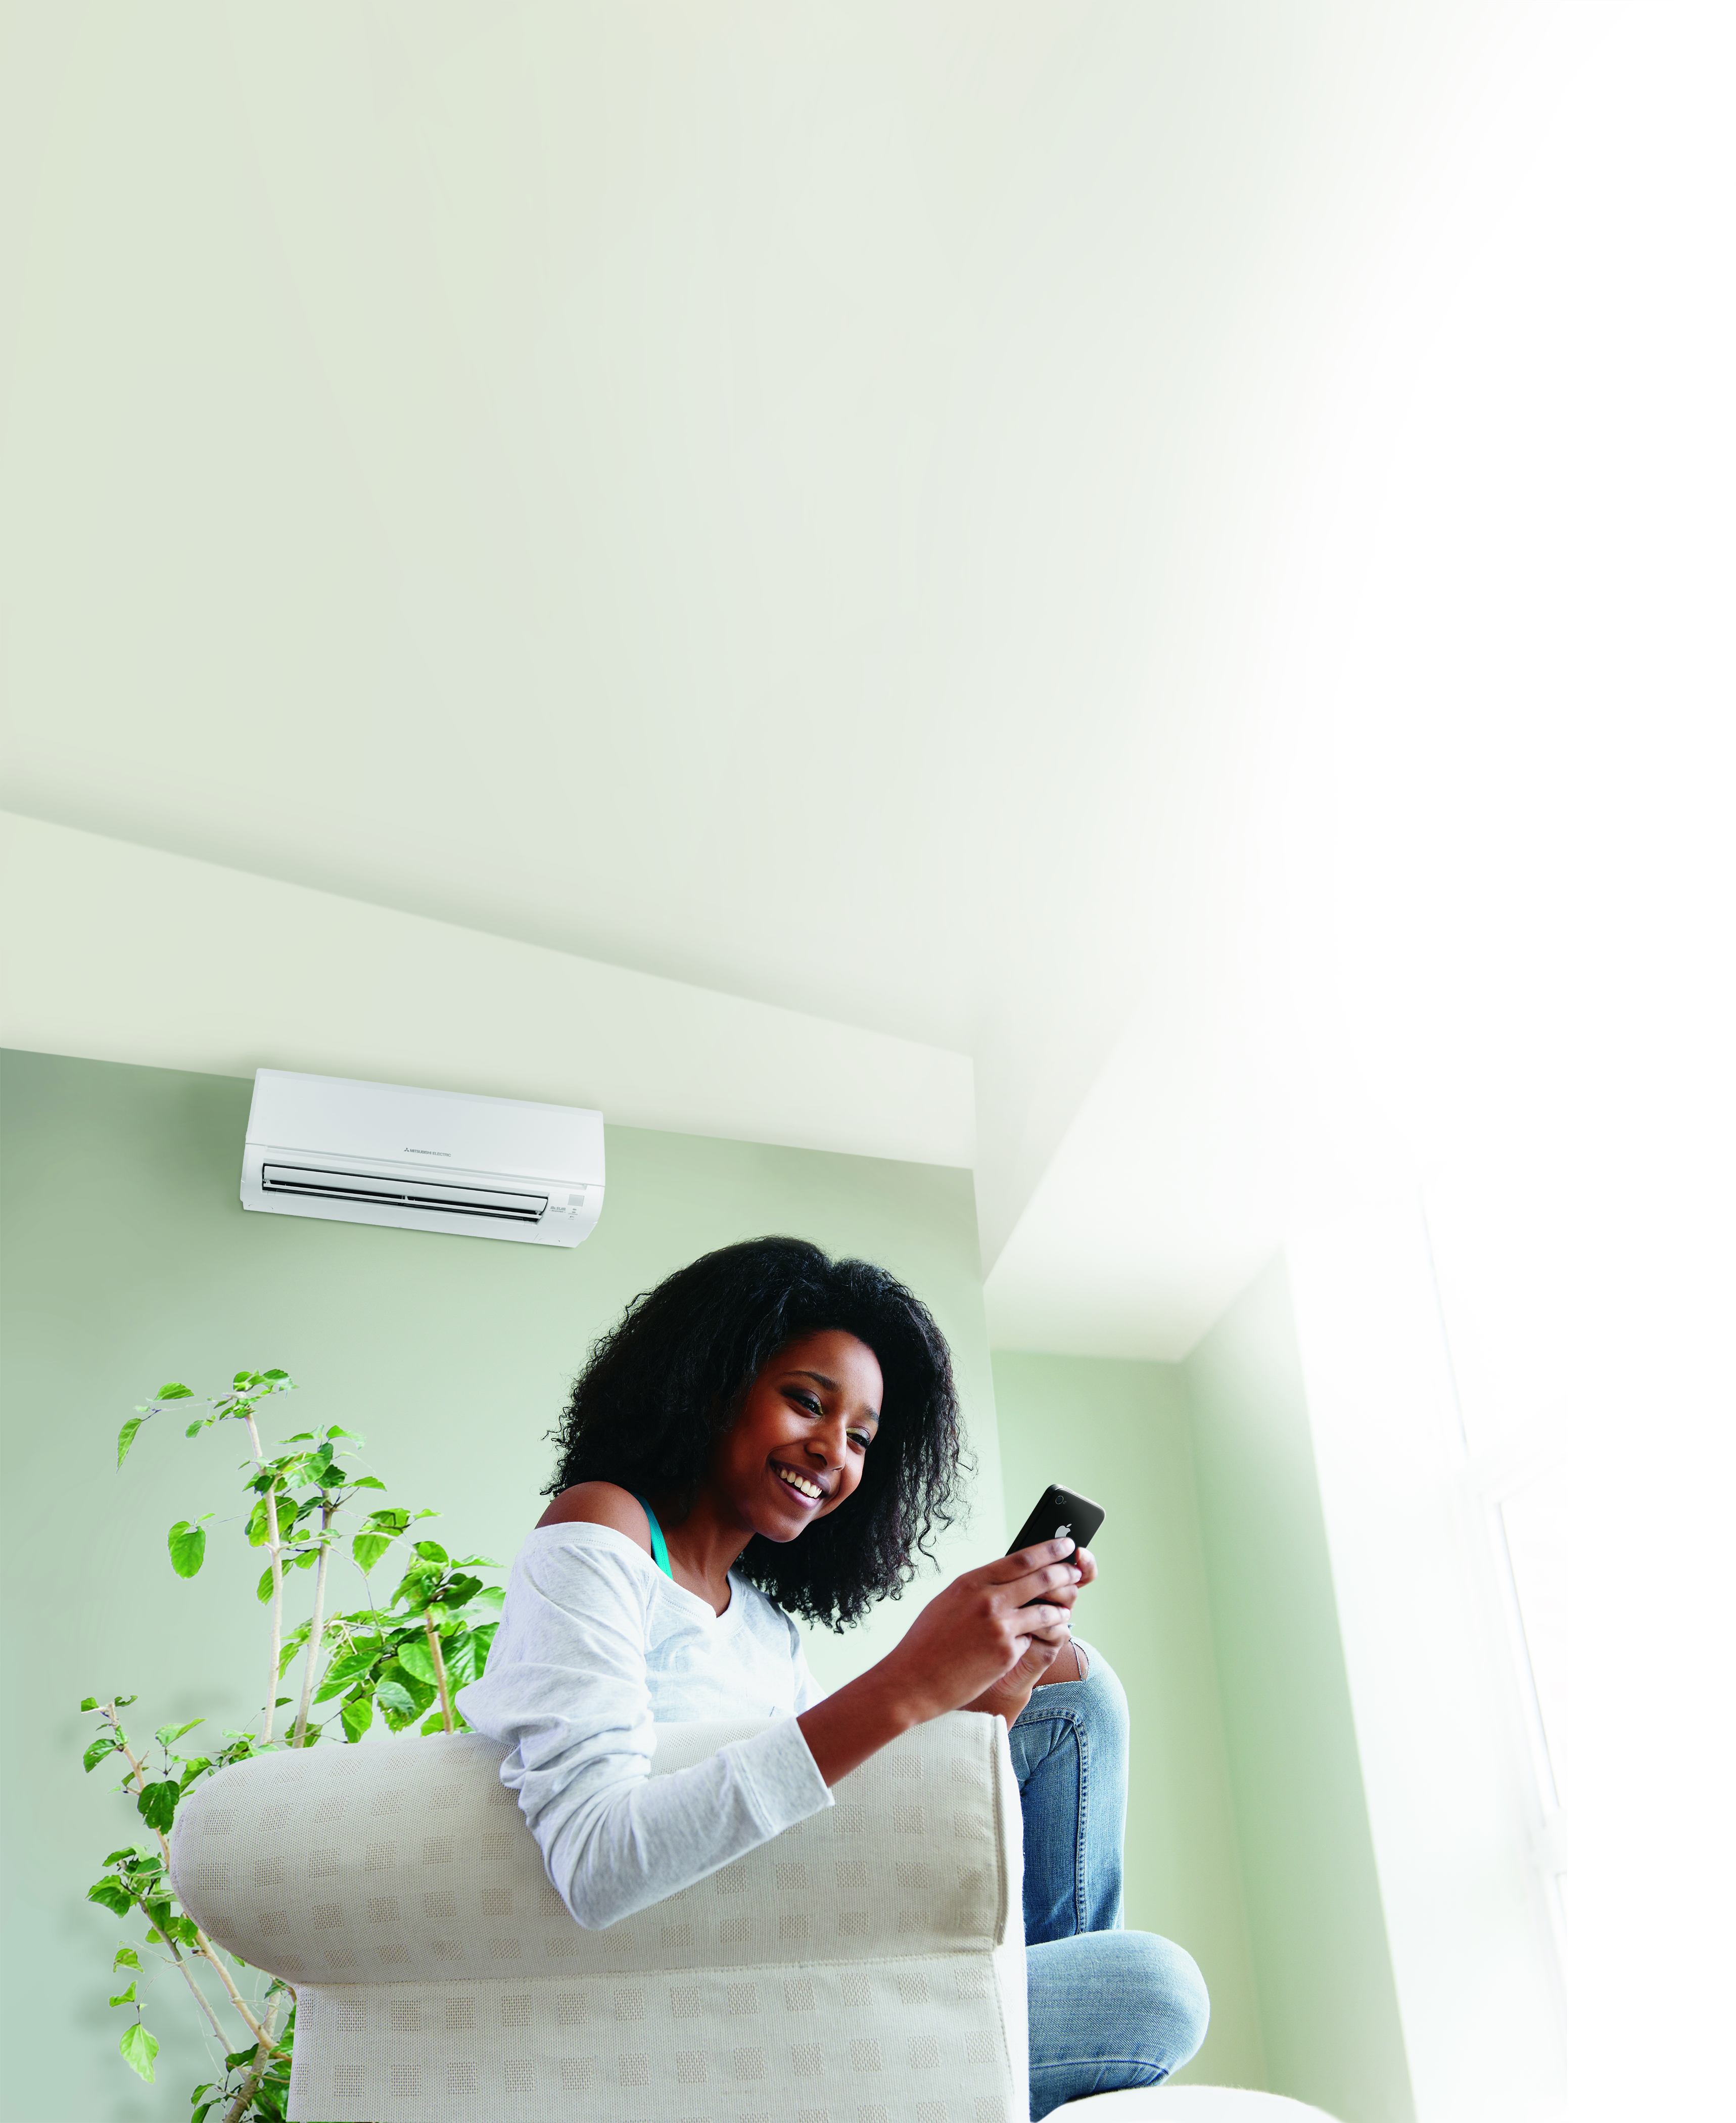 wall-mounted AC